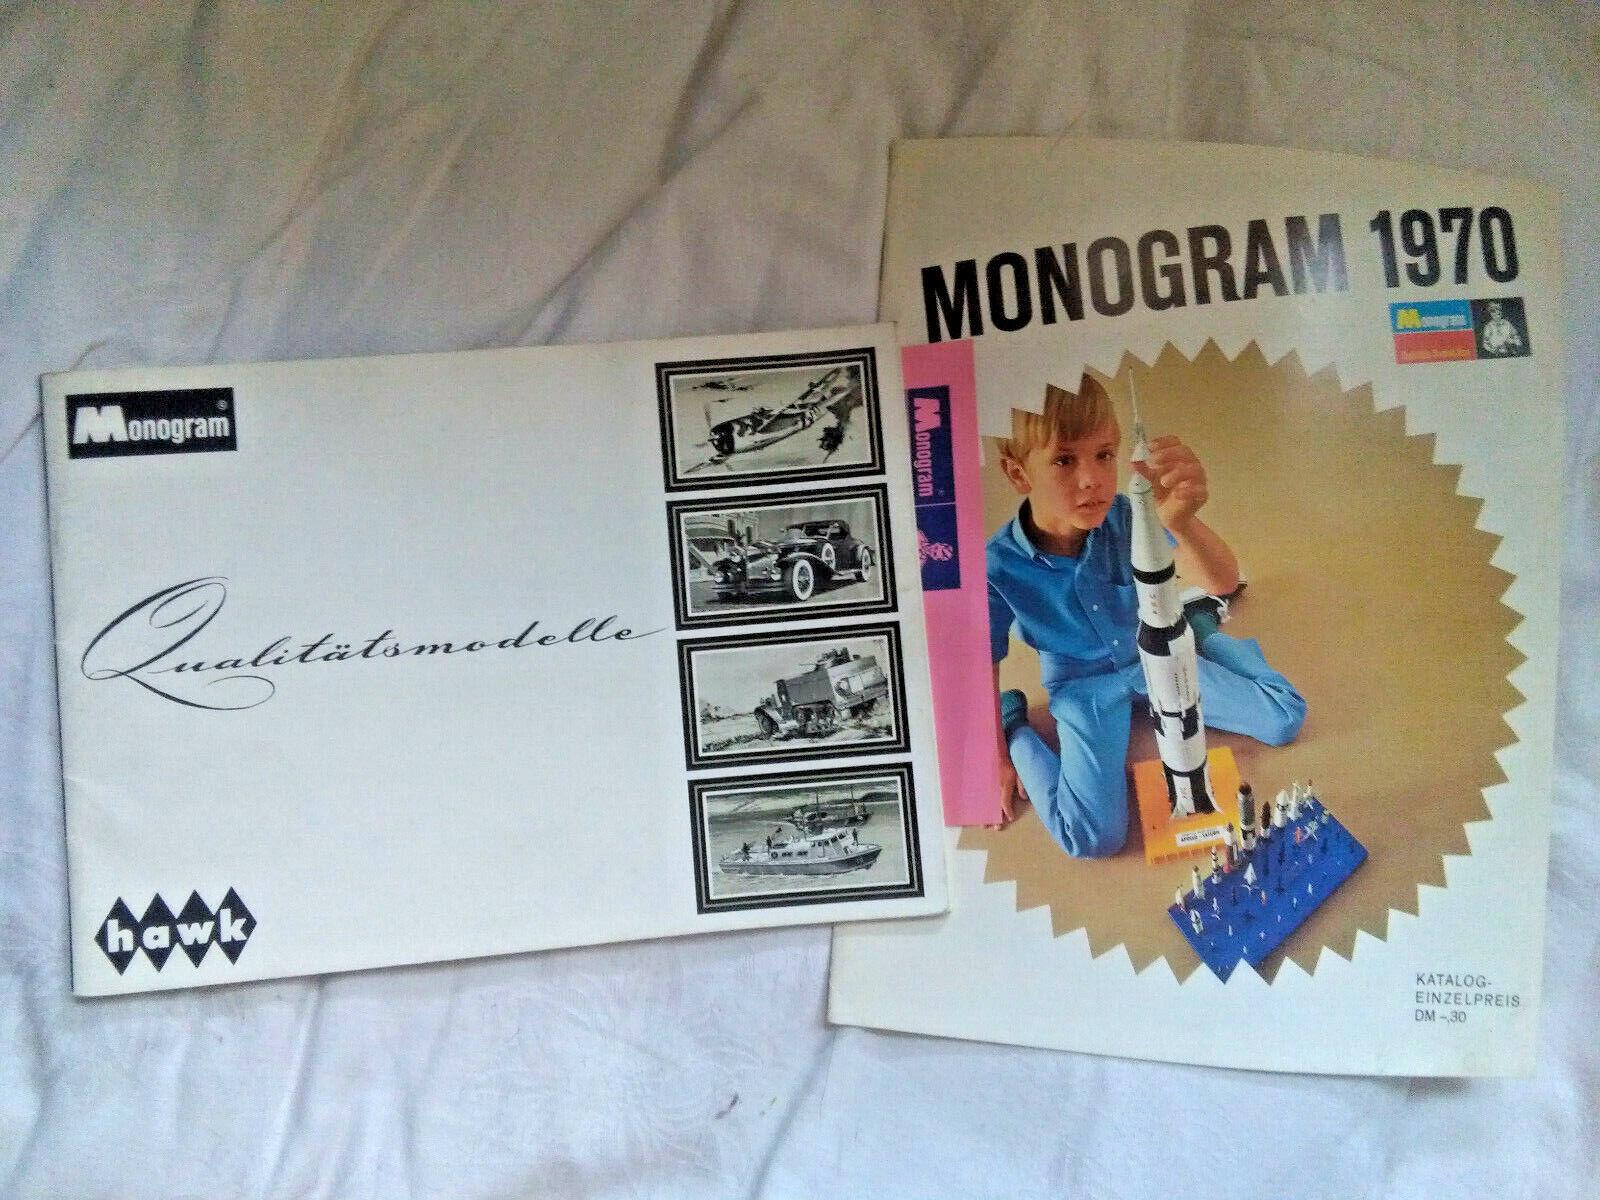 MODELLISMO: Monogram-Hawk-, 2 cataloghi, - 60er anni - 70er